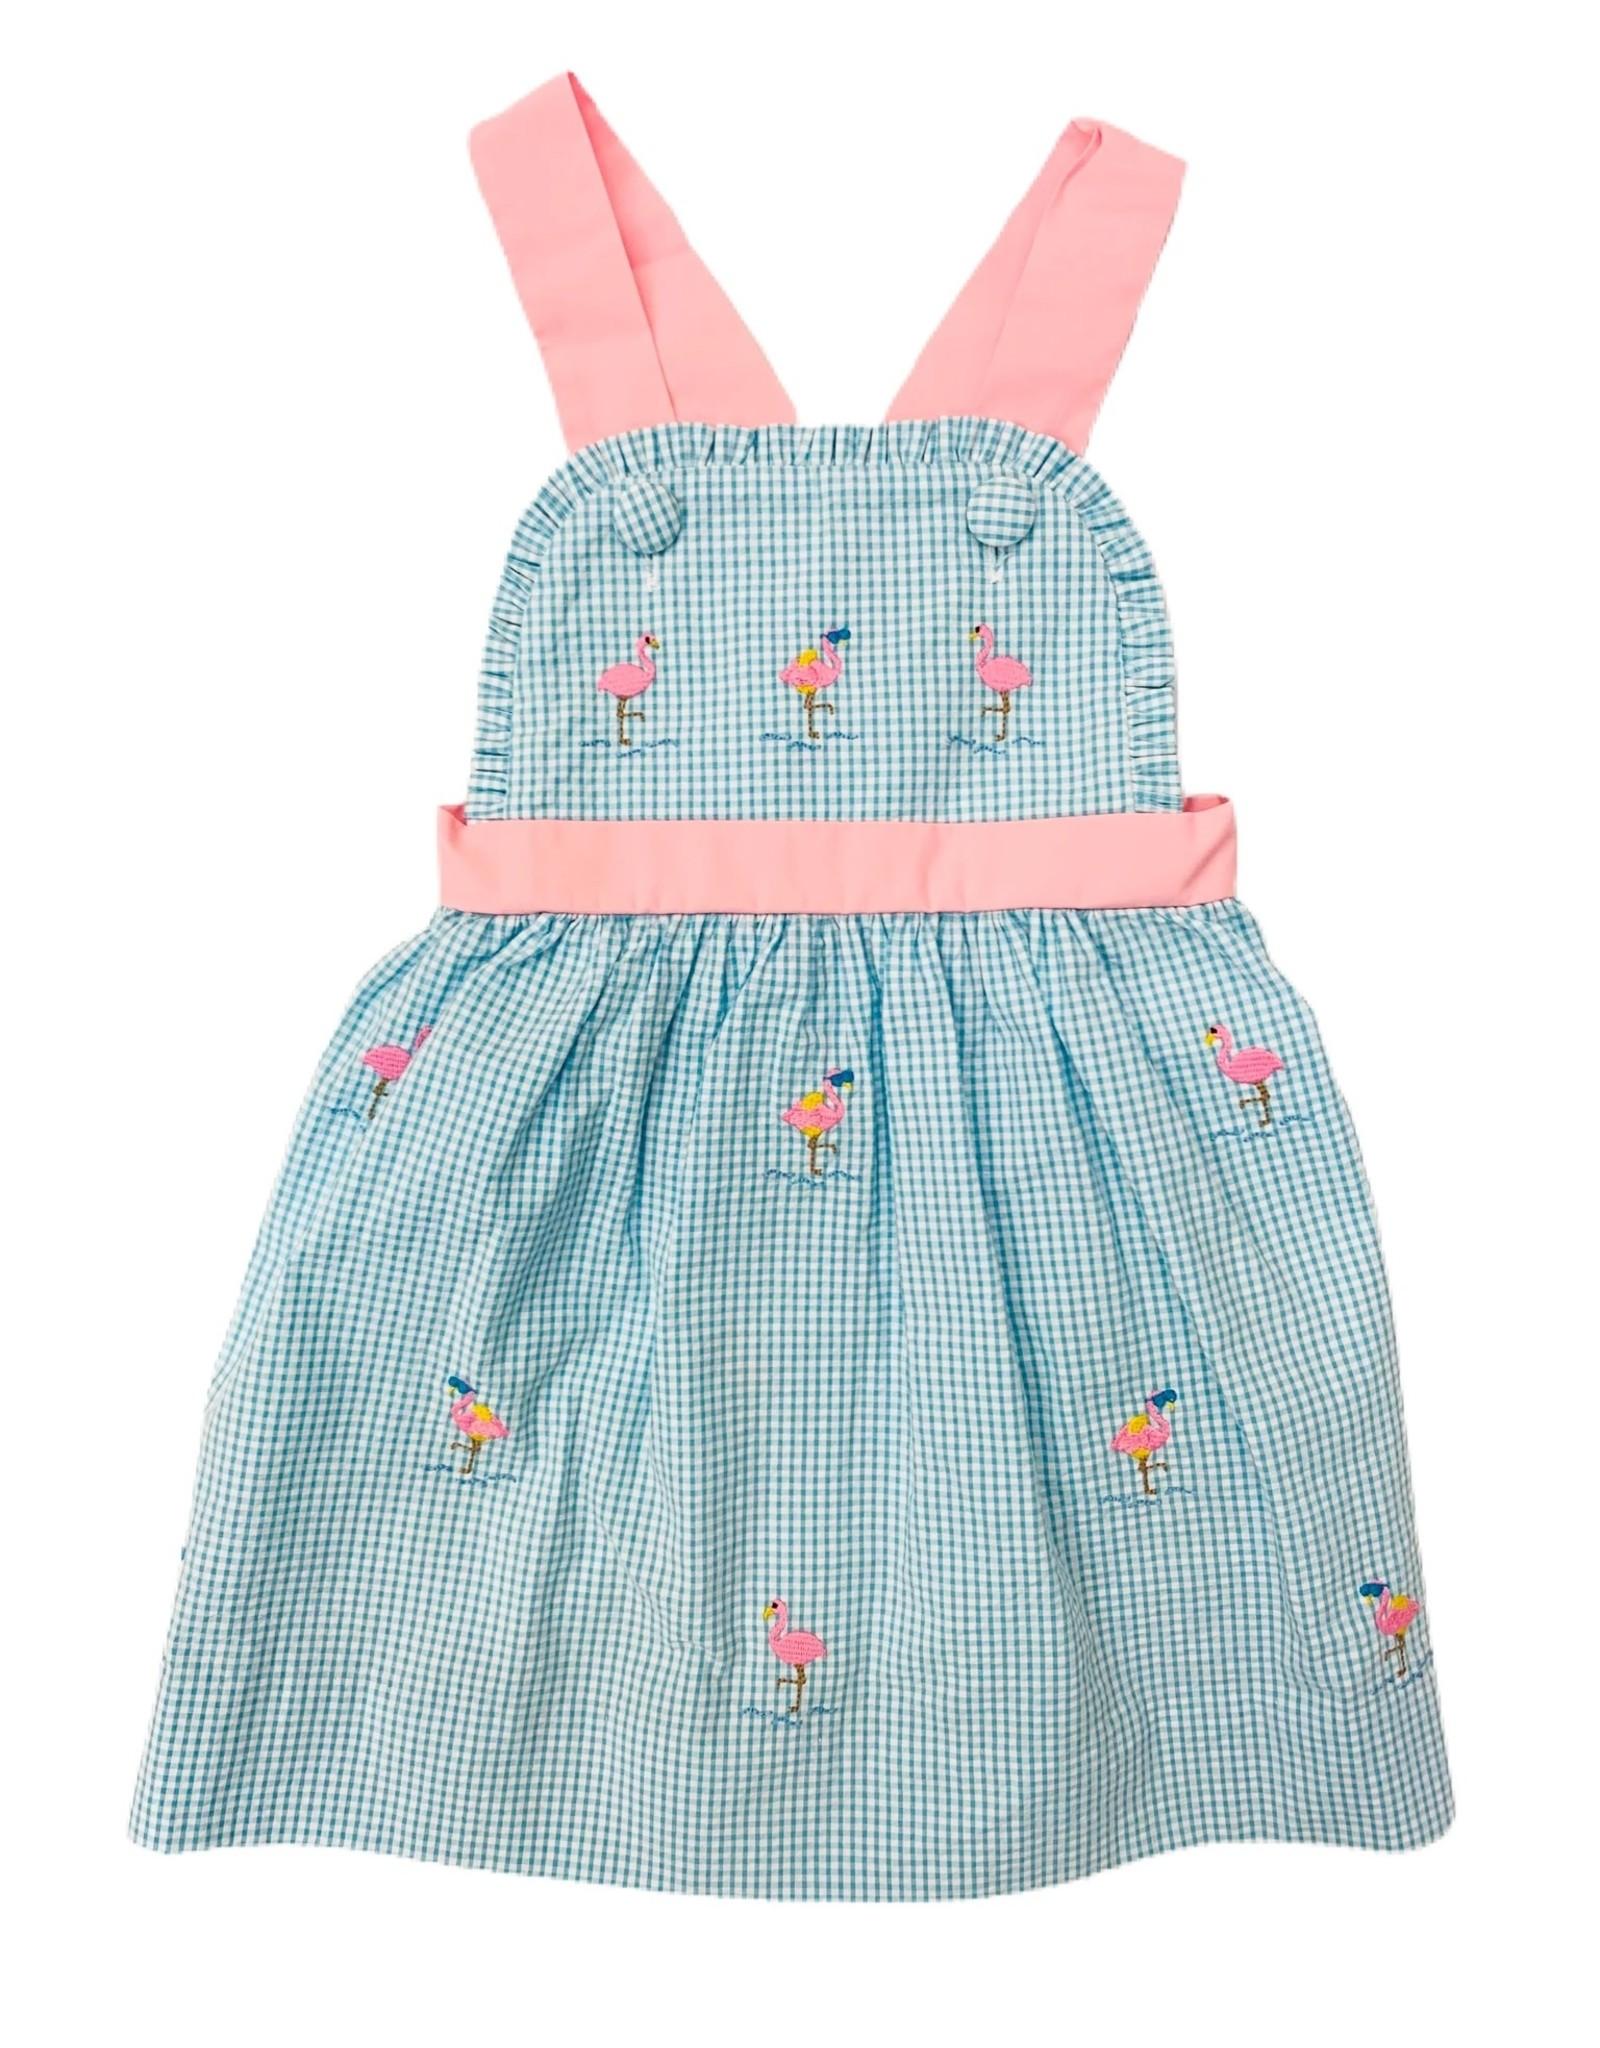 Zuccini Seersucker Mini Gingham Flamingo Bibbie Dress